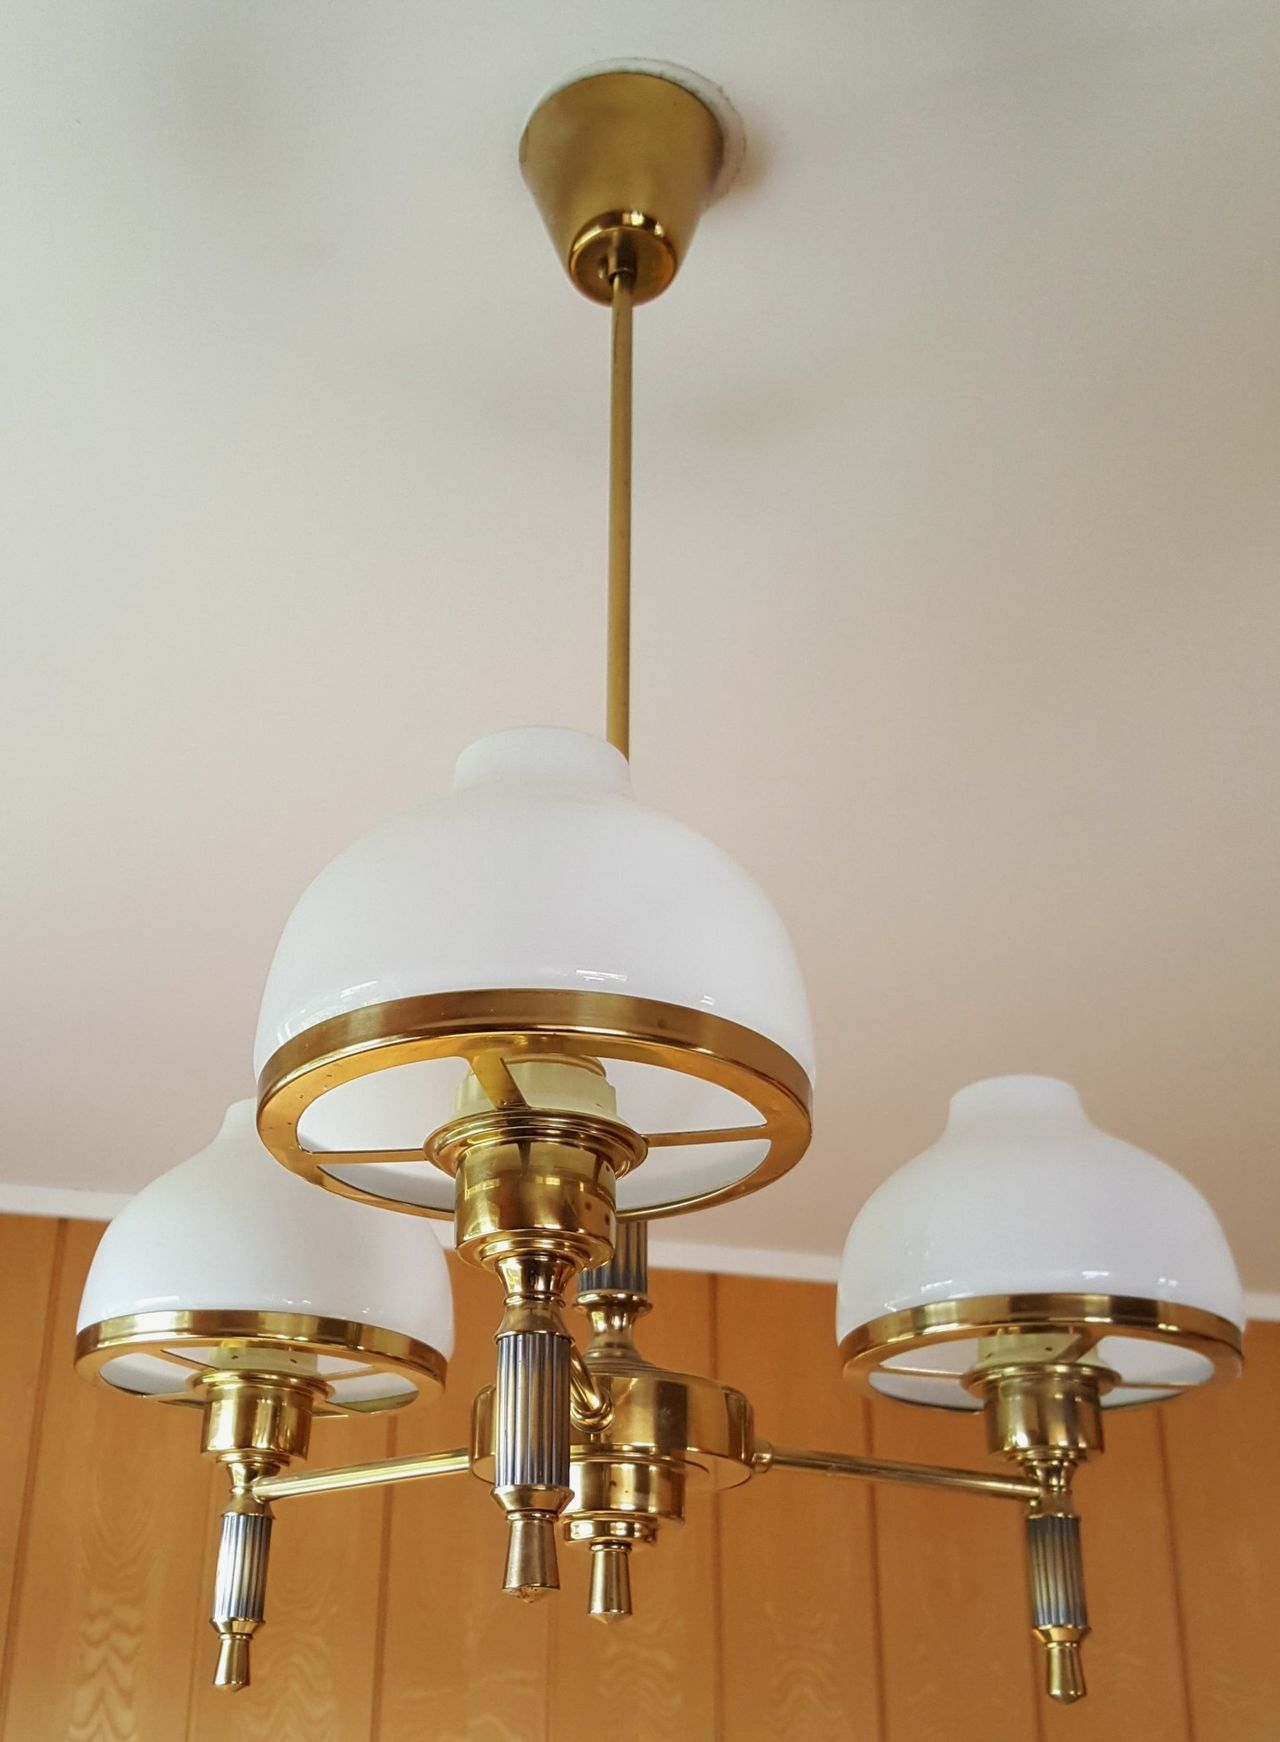 3 armet lampe